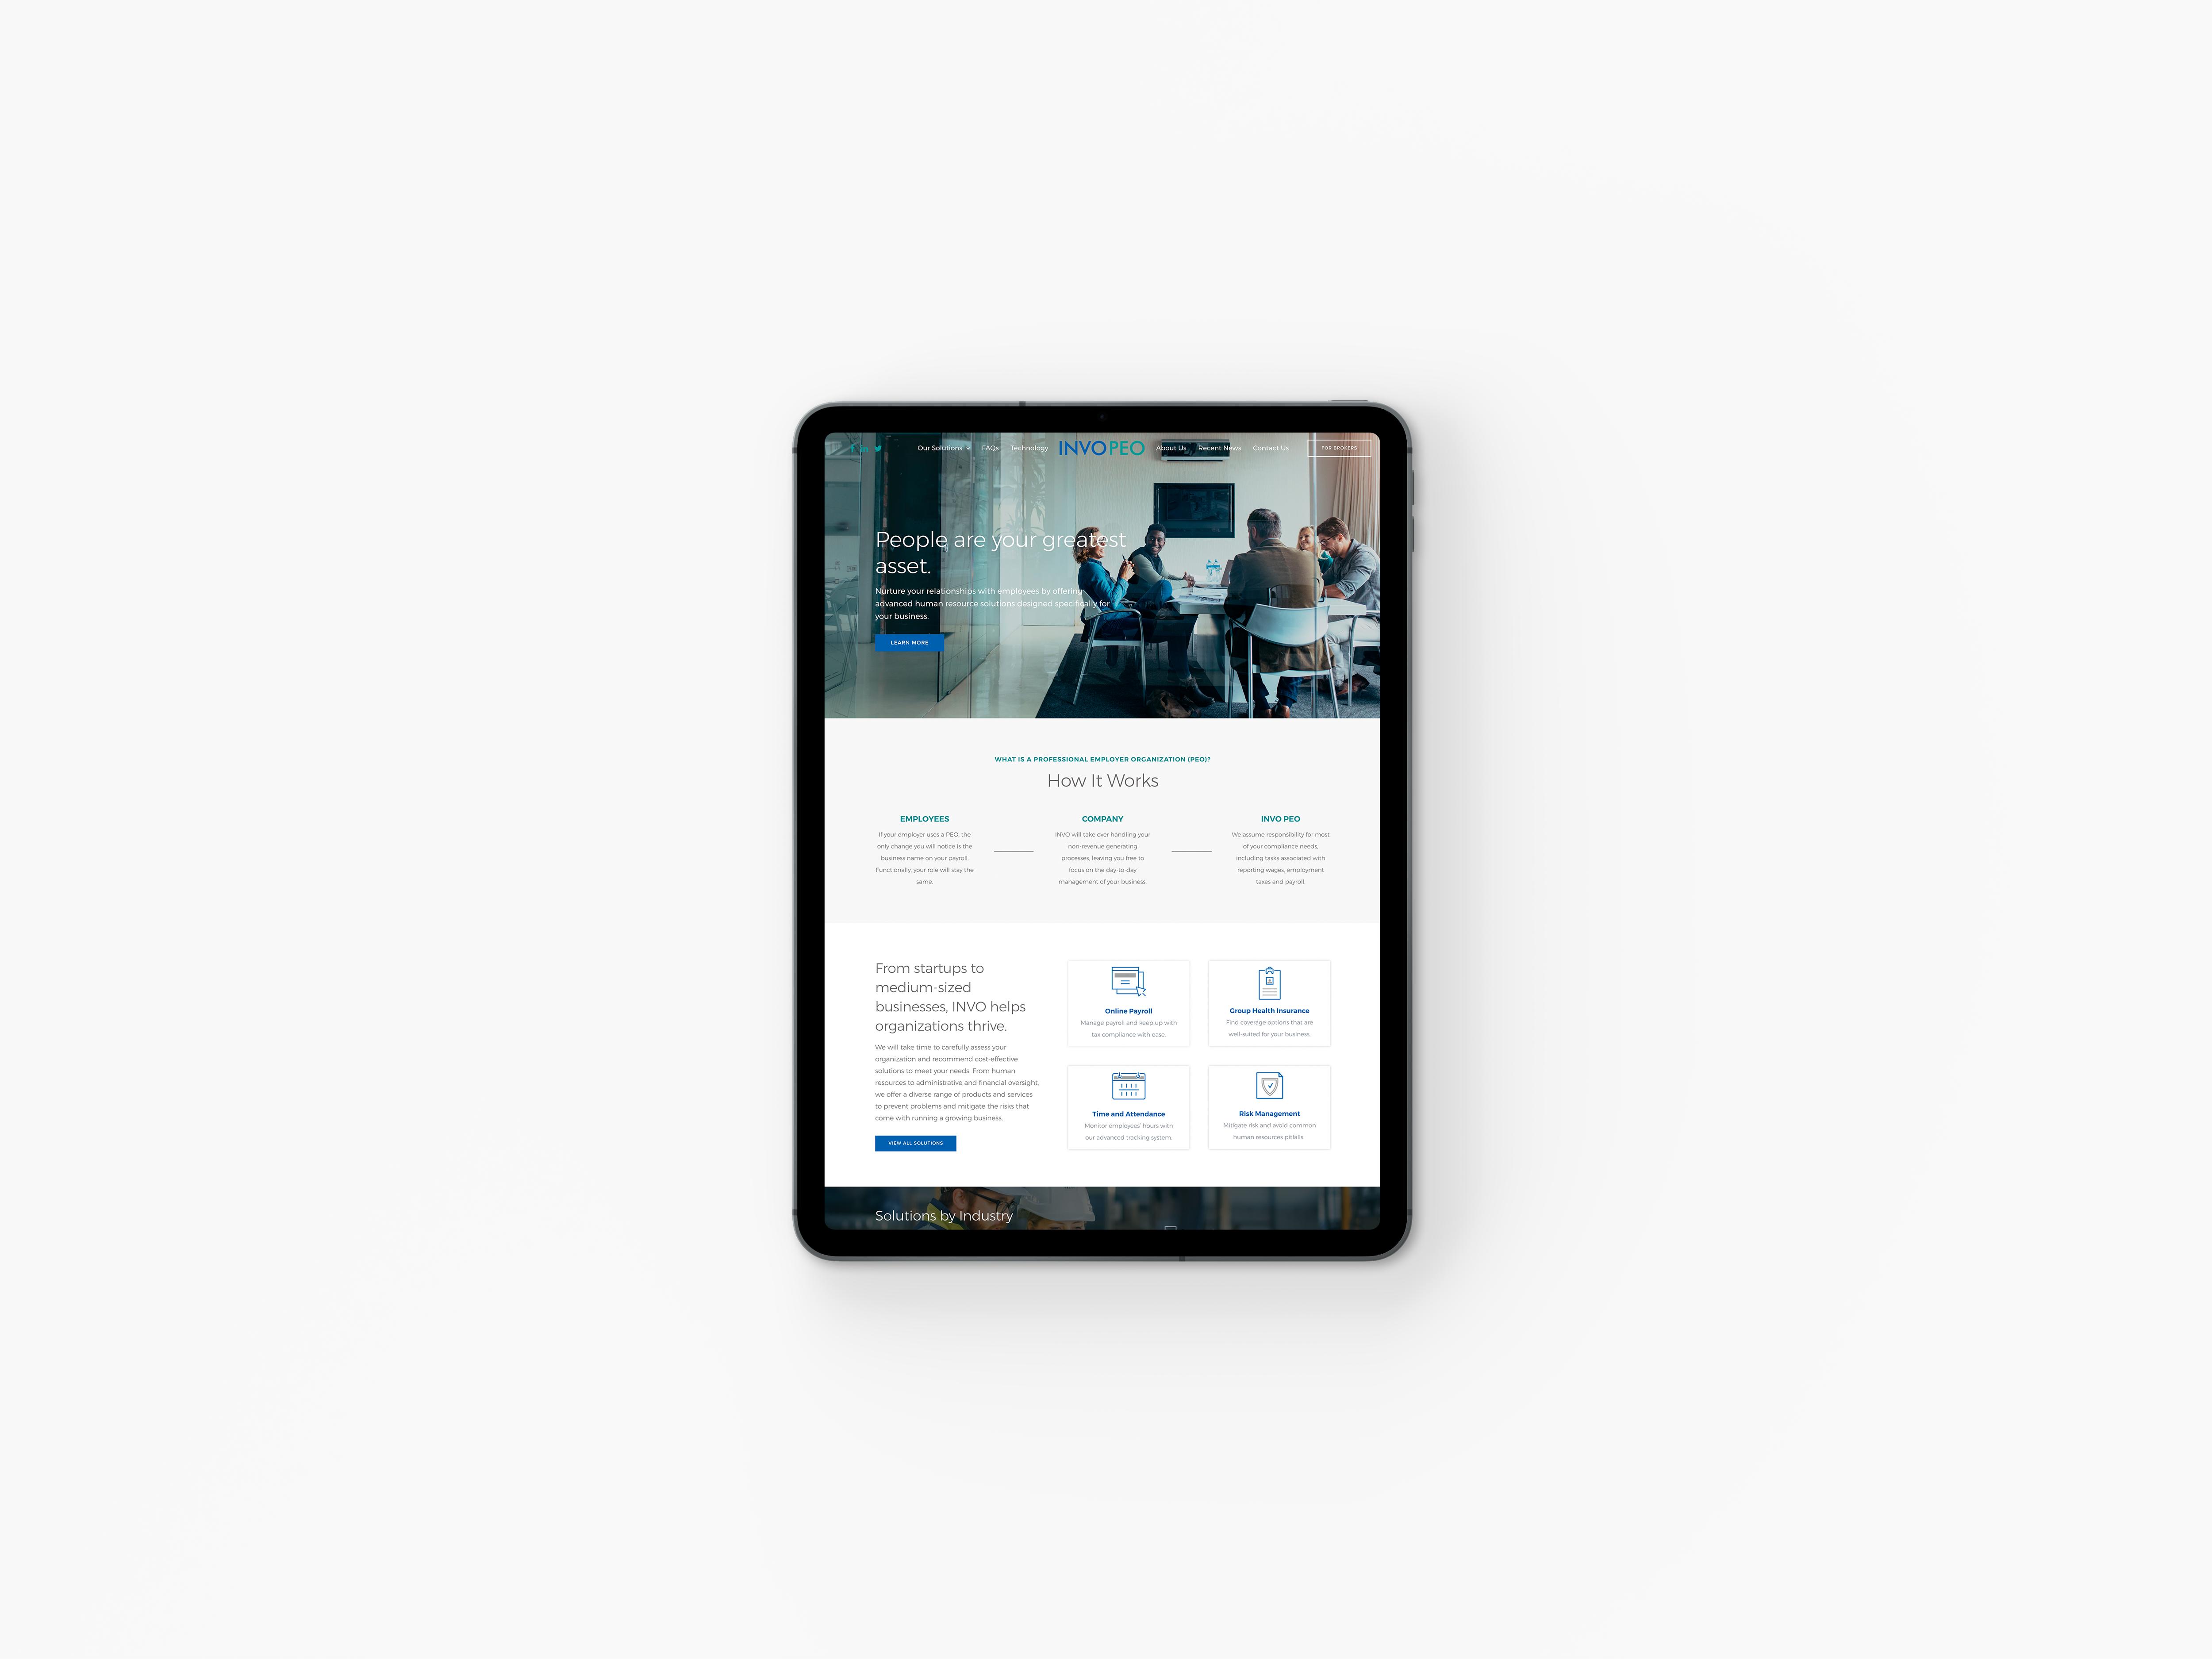 INVO_Website_iPad_WhiteBG copy 2